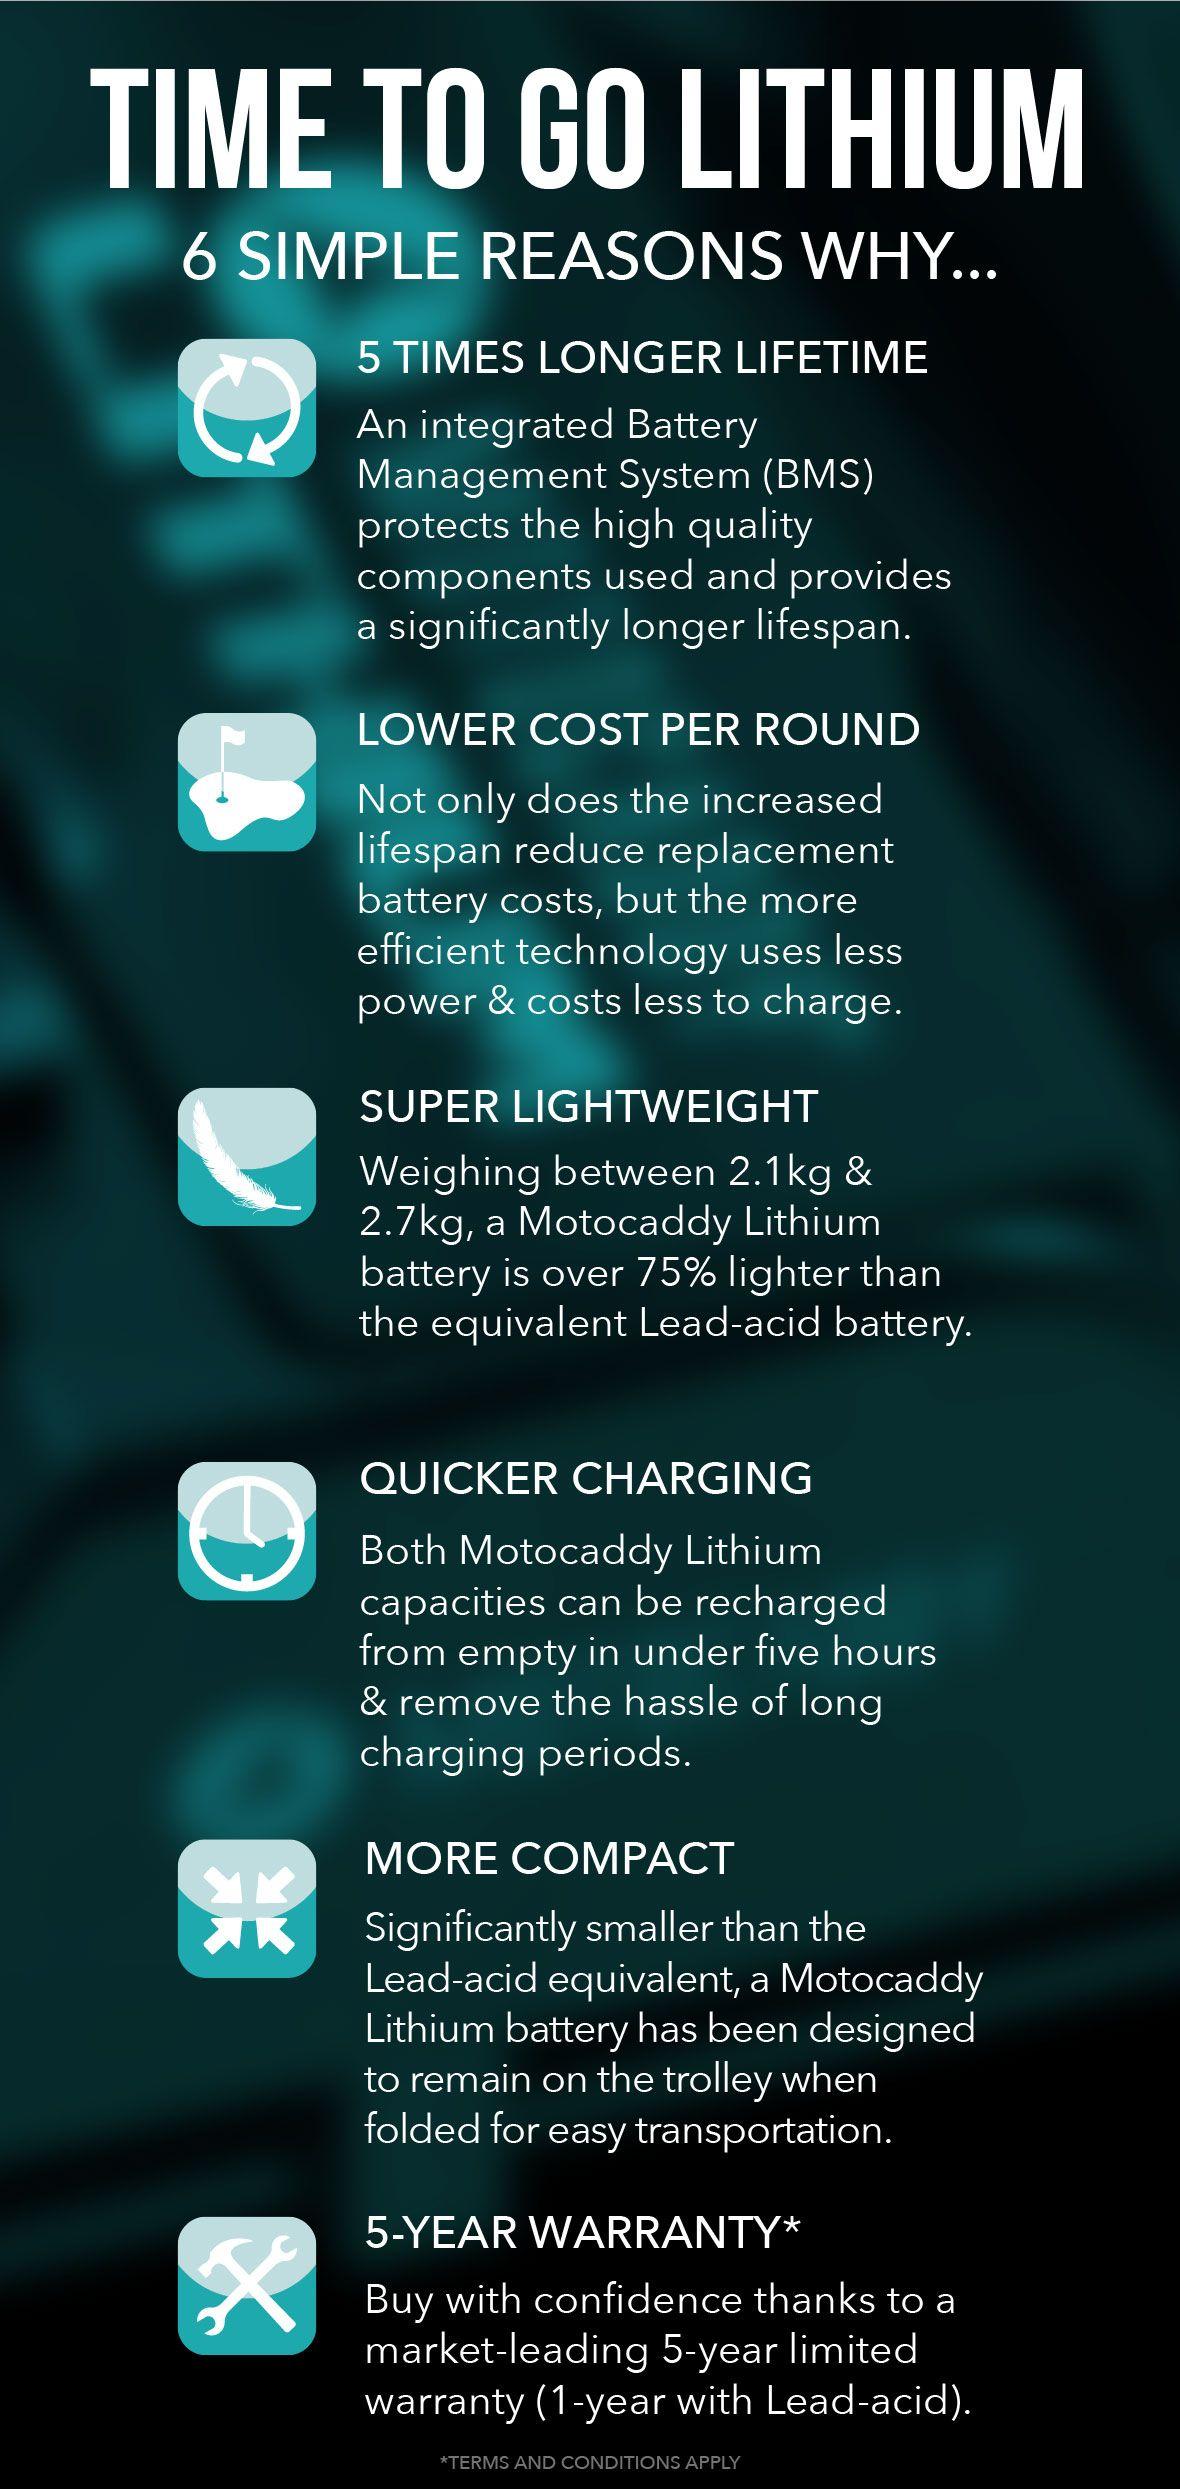 Motocaddy - Time to go Lithium